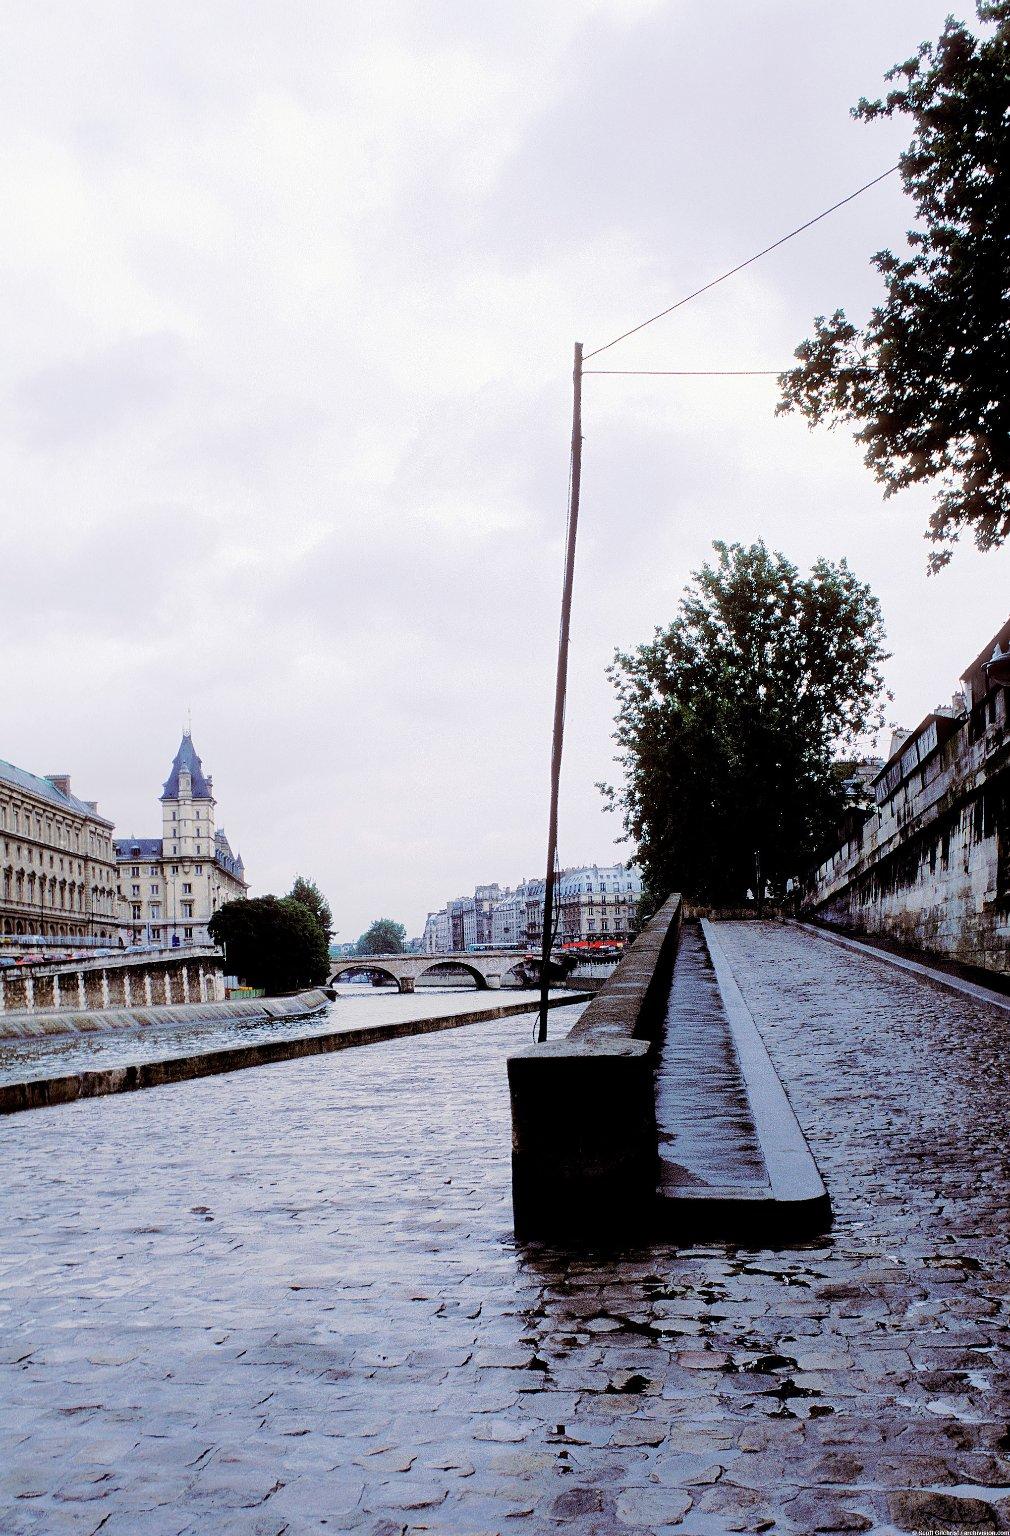 Paris Quays; Topographic Views